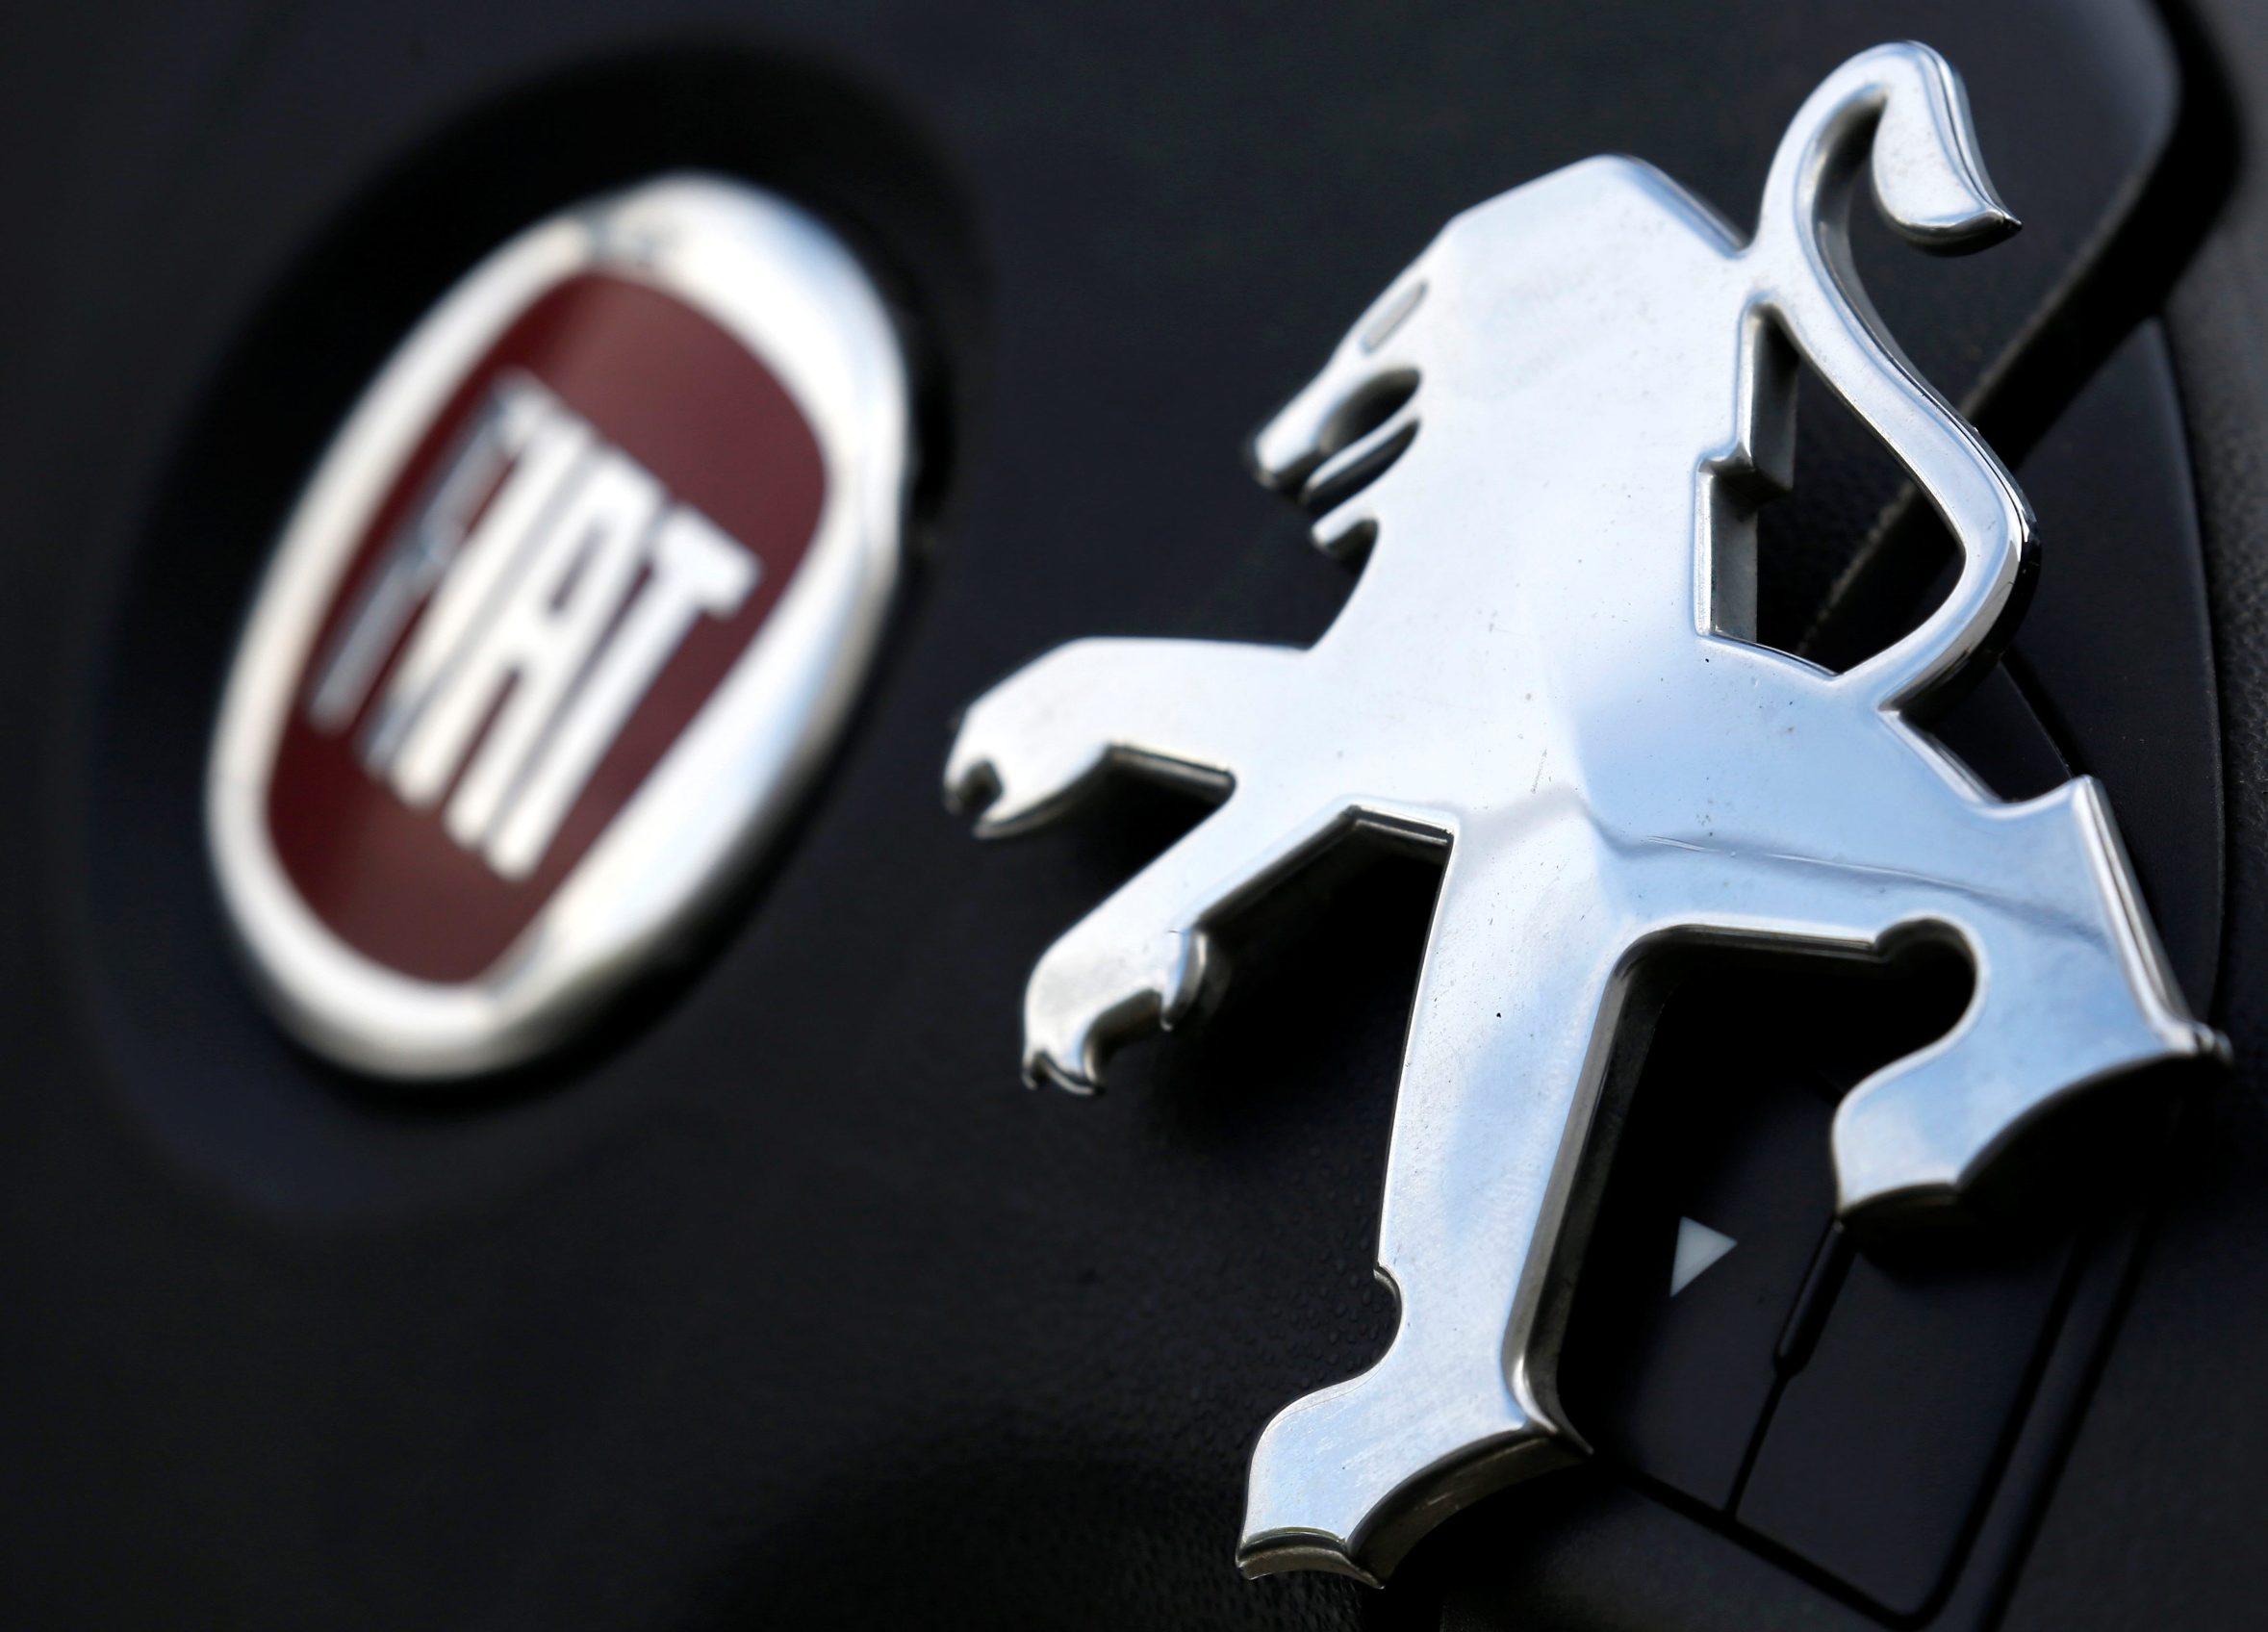 Ilustracija: logo Peugeota i Fiata